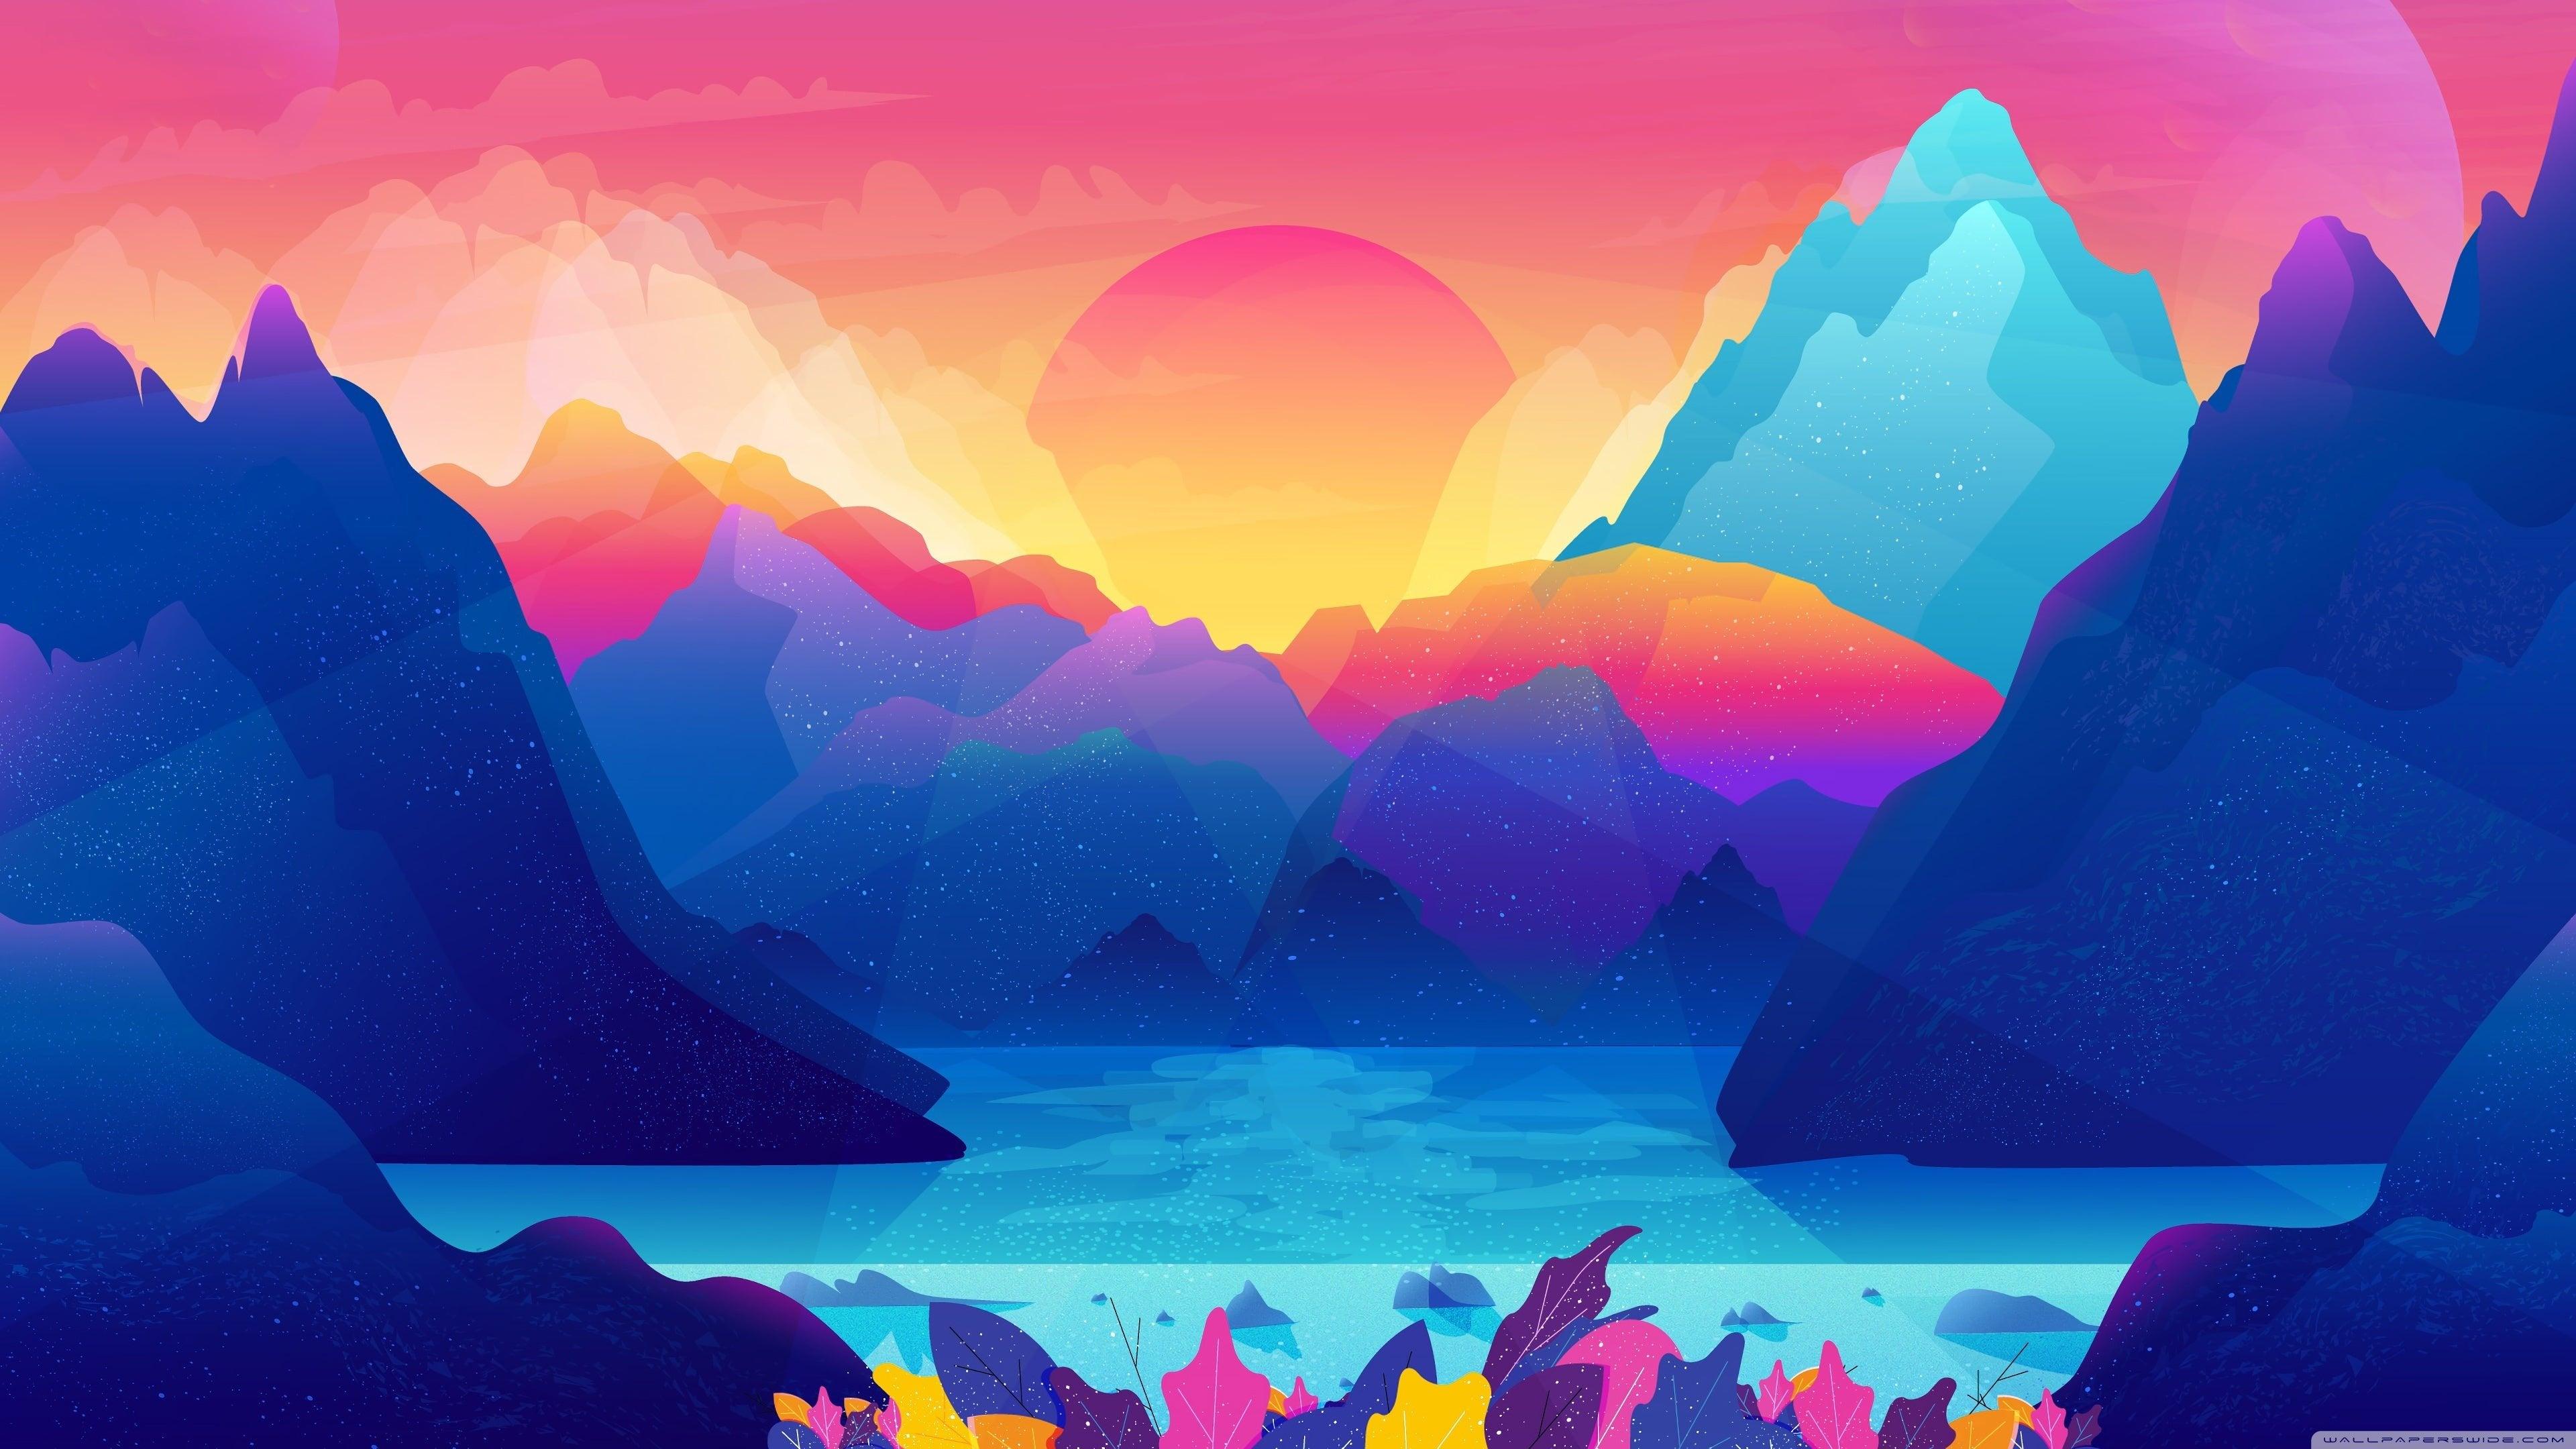 Free Download Animated Colorful Landscape 4k Wallpaper 3840x2160 For Your Desktop Mobile Tablet Explore 29 Animated Wallpaper Animated Underwater Wallpaper Animated Techno Wallpaper Animated Angel Wallpaper